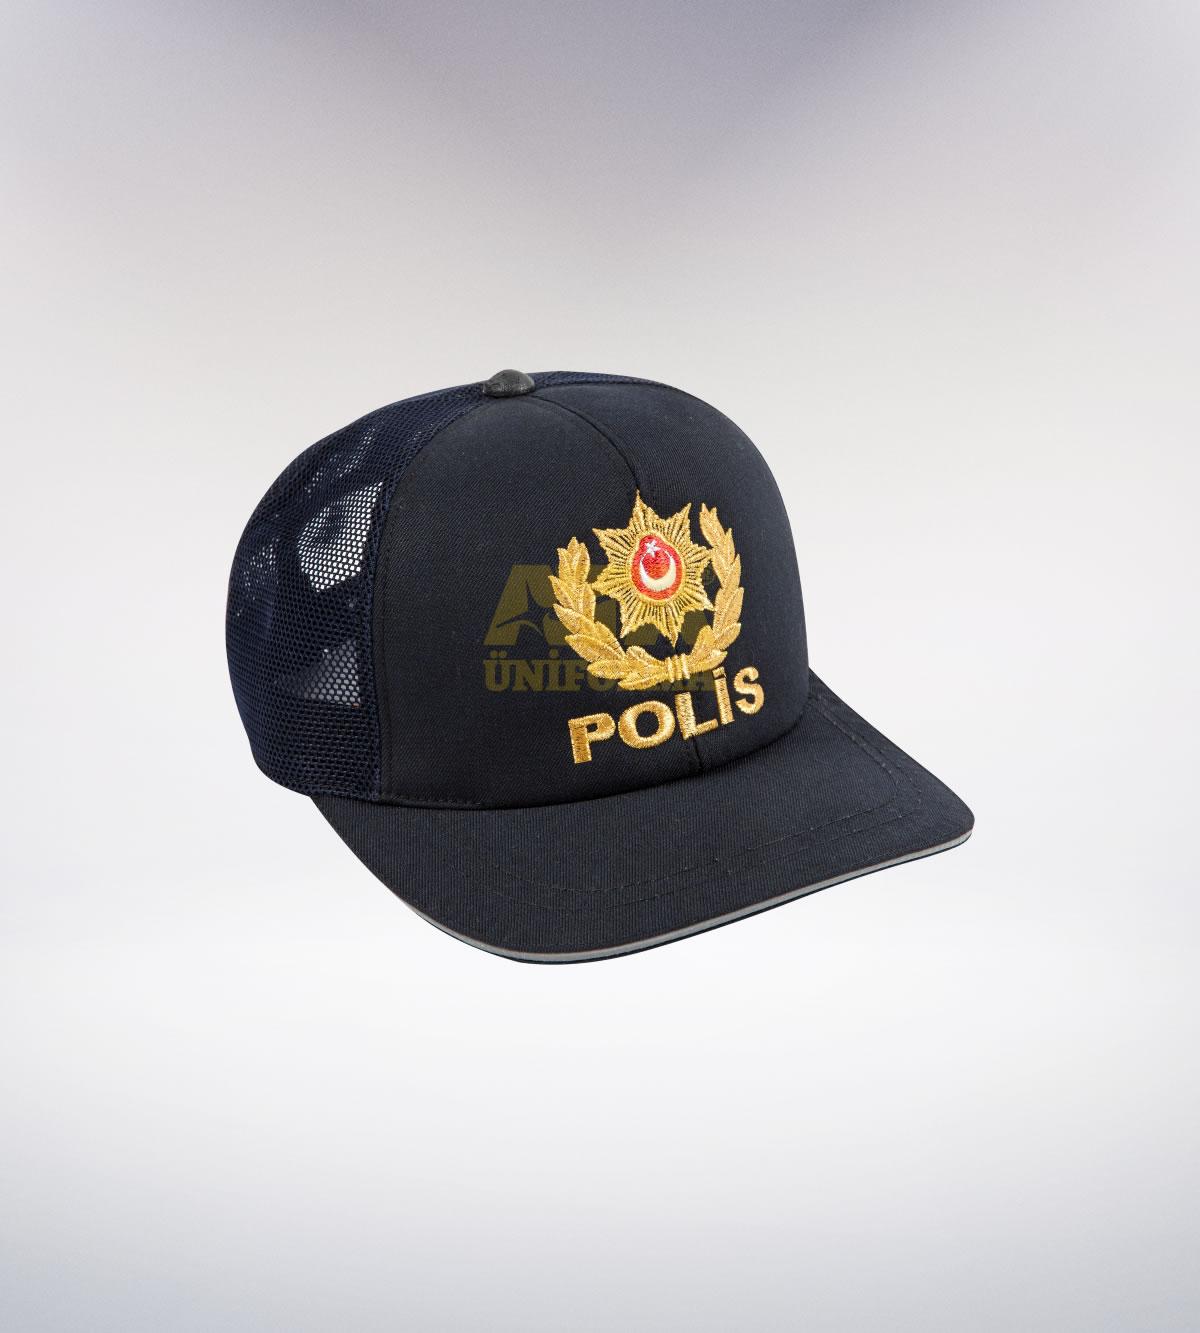 ATA-1101 Polis kepi - polis elbiseleri | polis  üniformaları | polis kıyafetleri